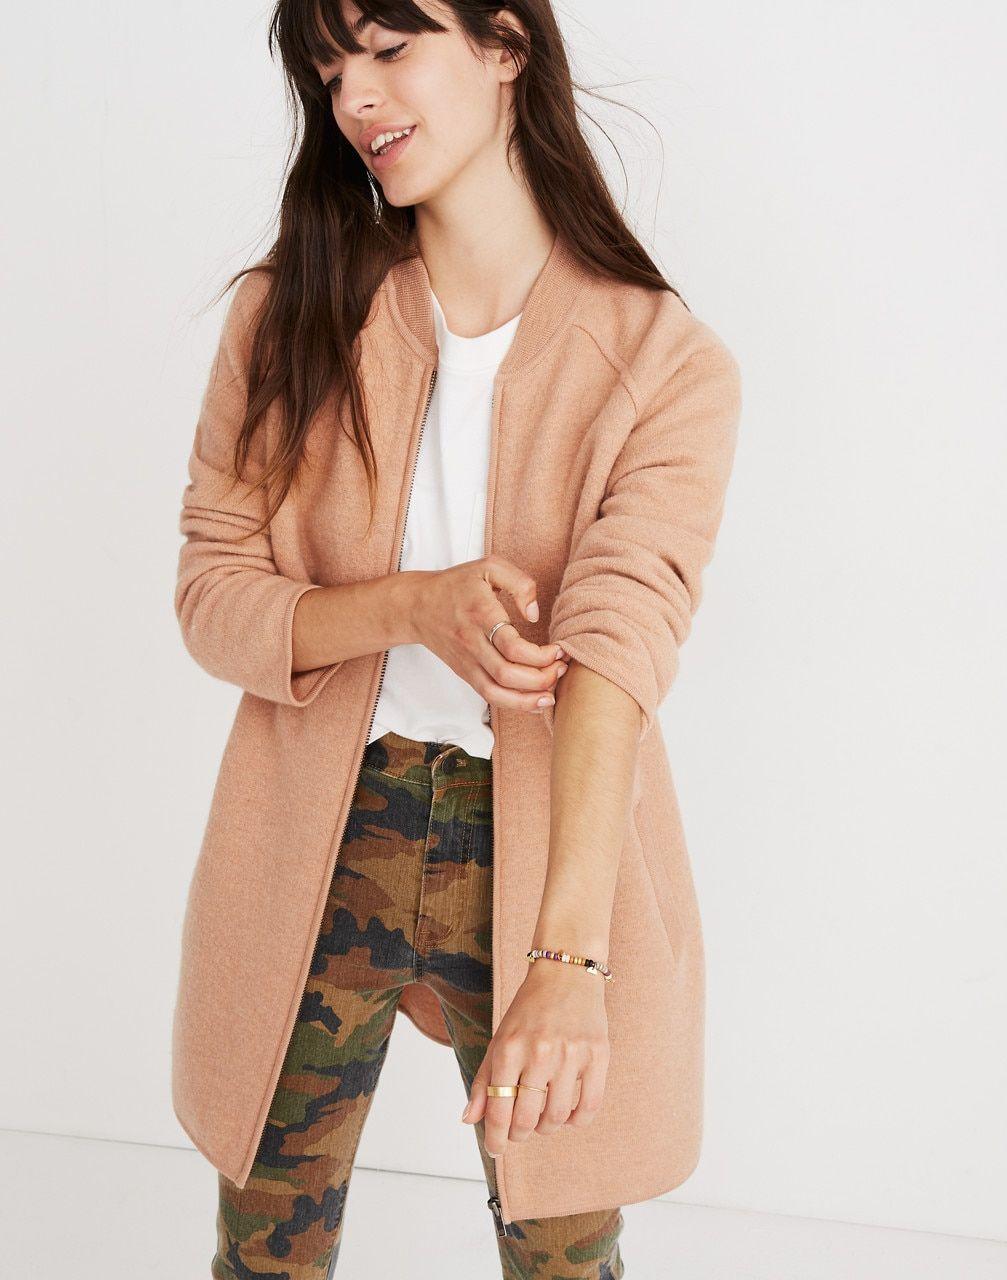 c78e70b518a1b Madewell Womens Bomber Sweater-Jacket | fashion | Sweater jacket ...